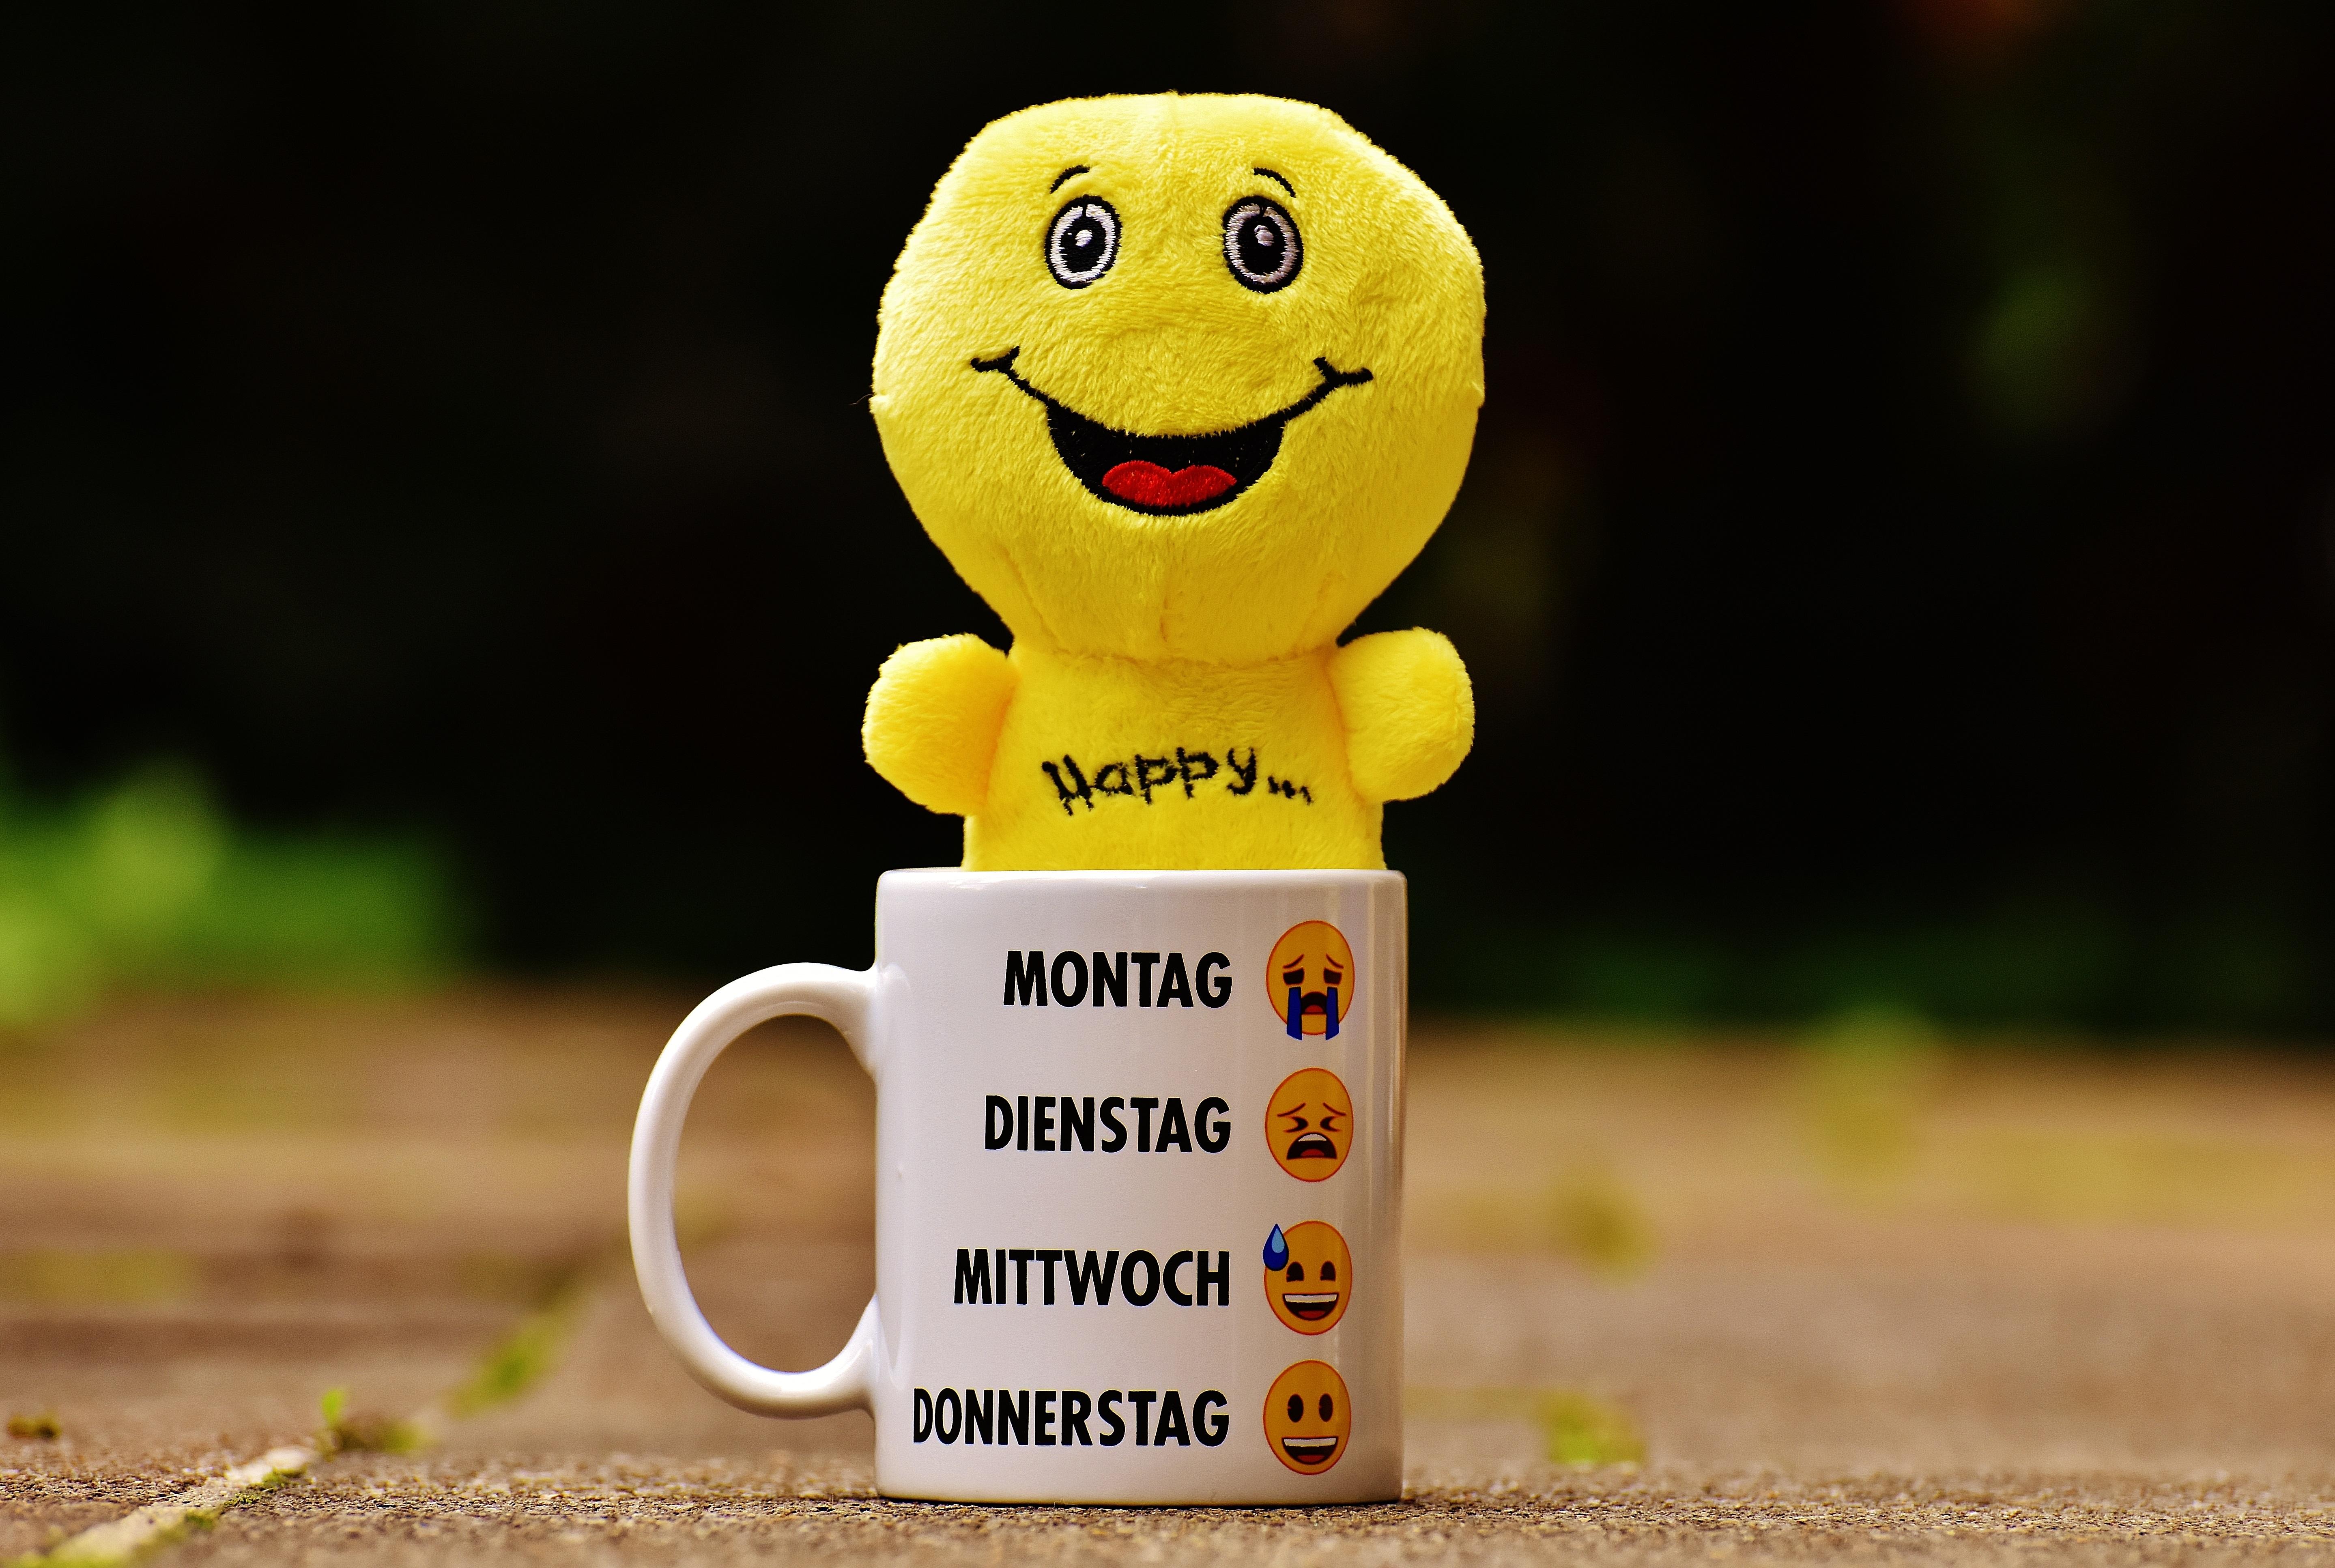 Gambar Cangkir Makanan Warna Kuning Mainan Tersenyum